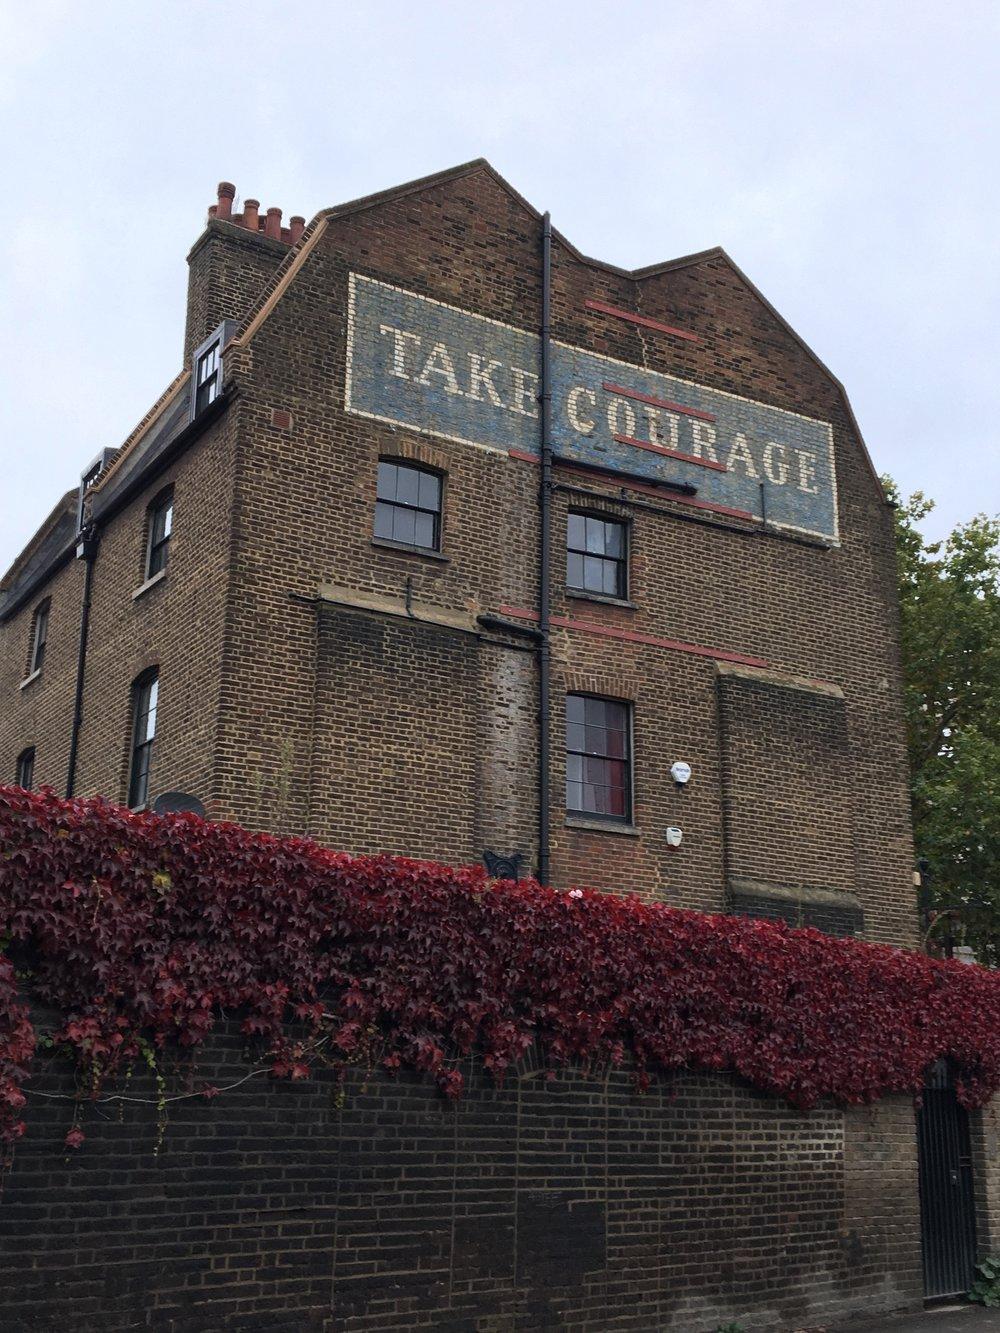 21 Park St, London SE1 9EQ, UK